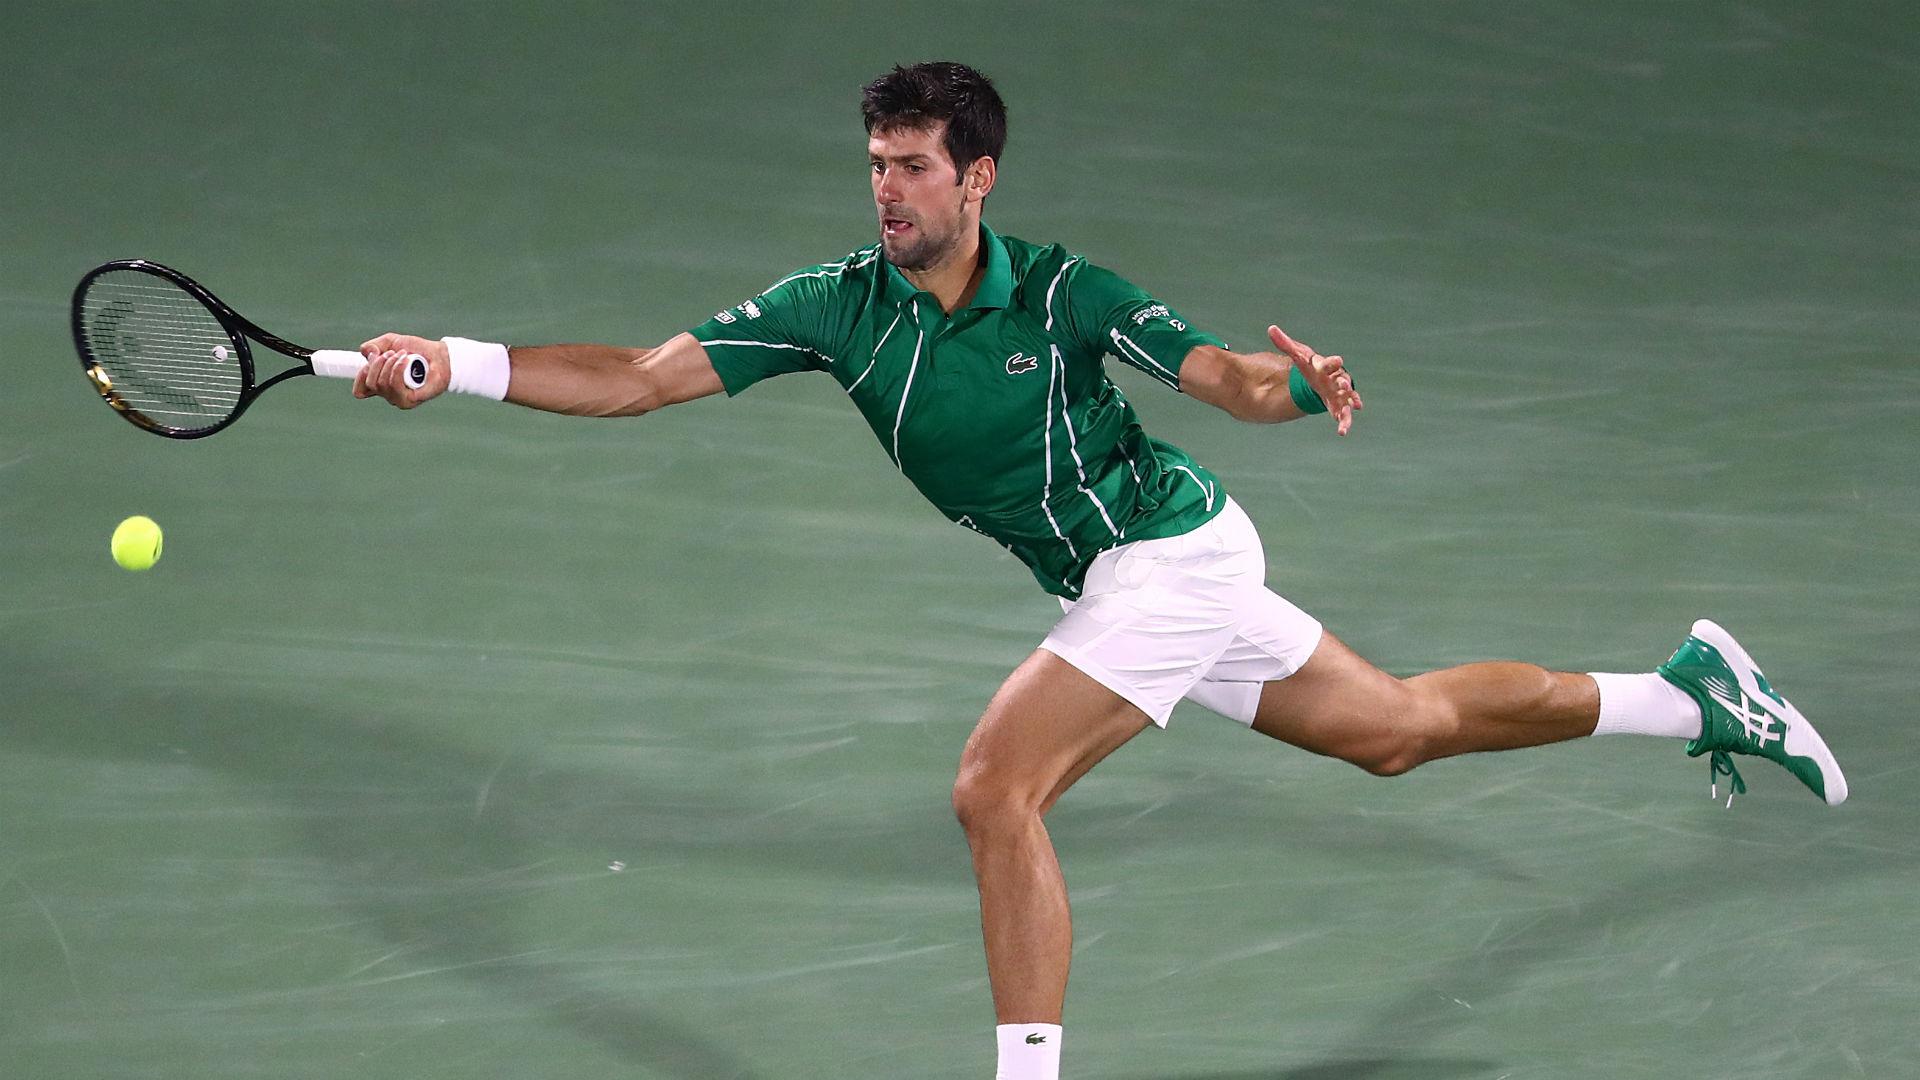 Novak Djokovic - Serbia